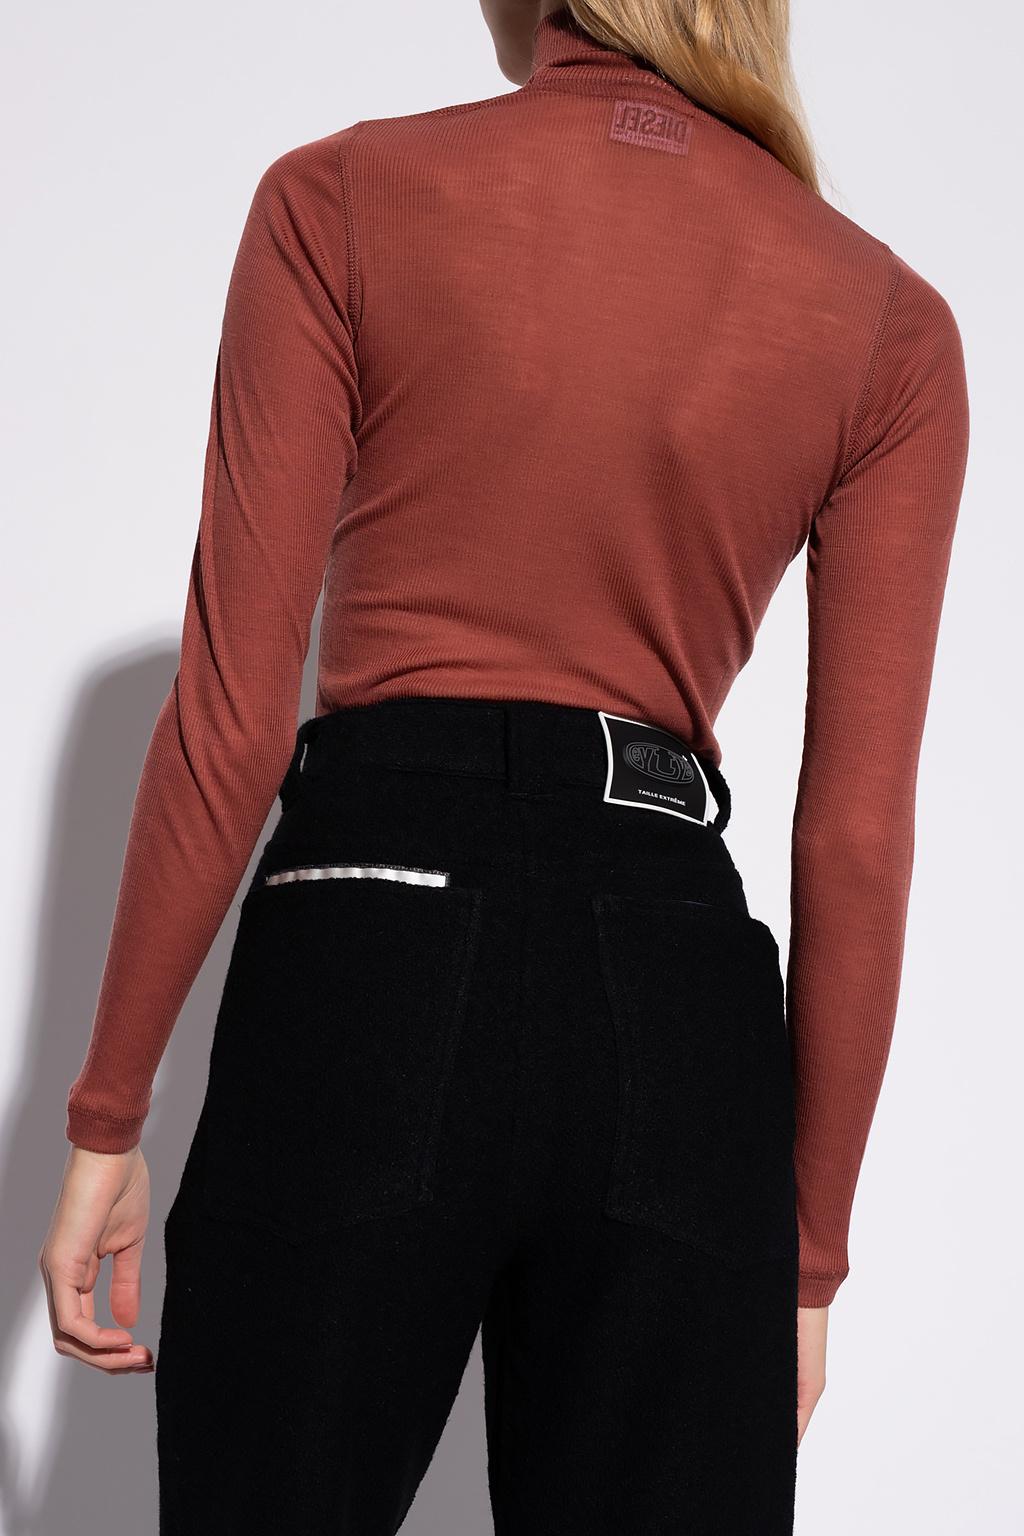 Diesel Ribbed turtleneck sweater